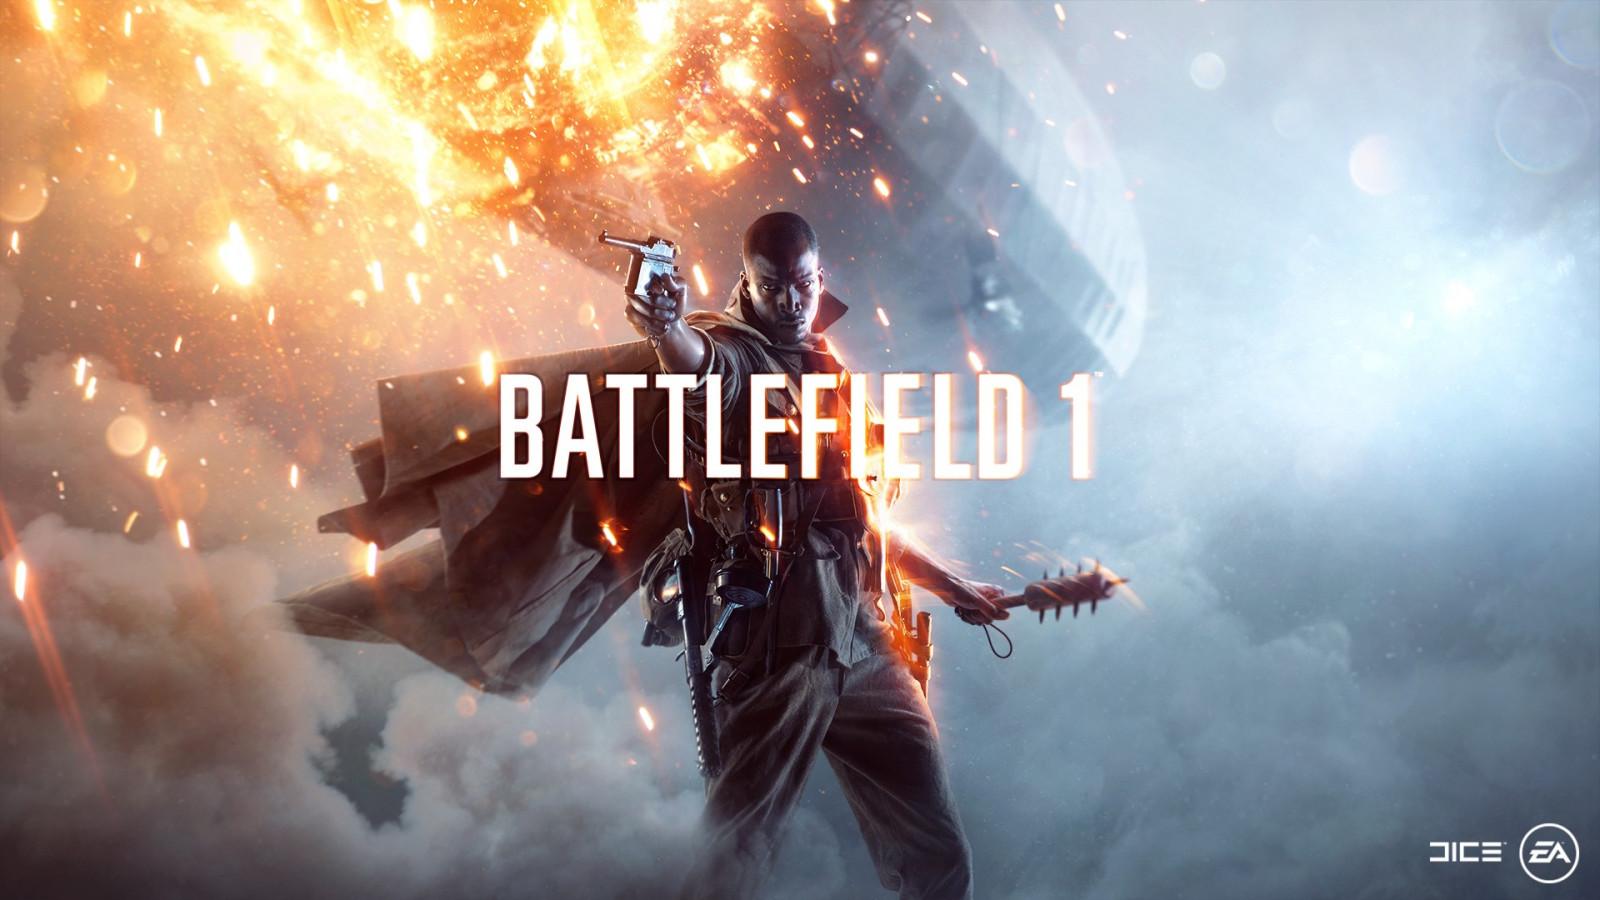 Amazing Wallpaper Gaming Battlefield - Battlefield_1_PC_gaming-51376  Pic_1163100 .jpg!d